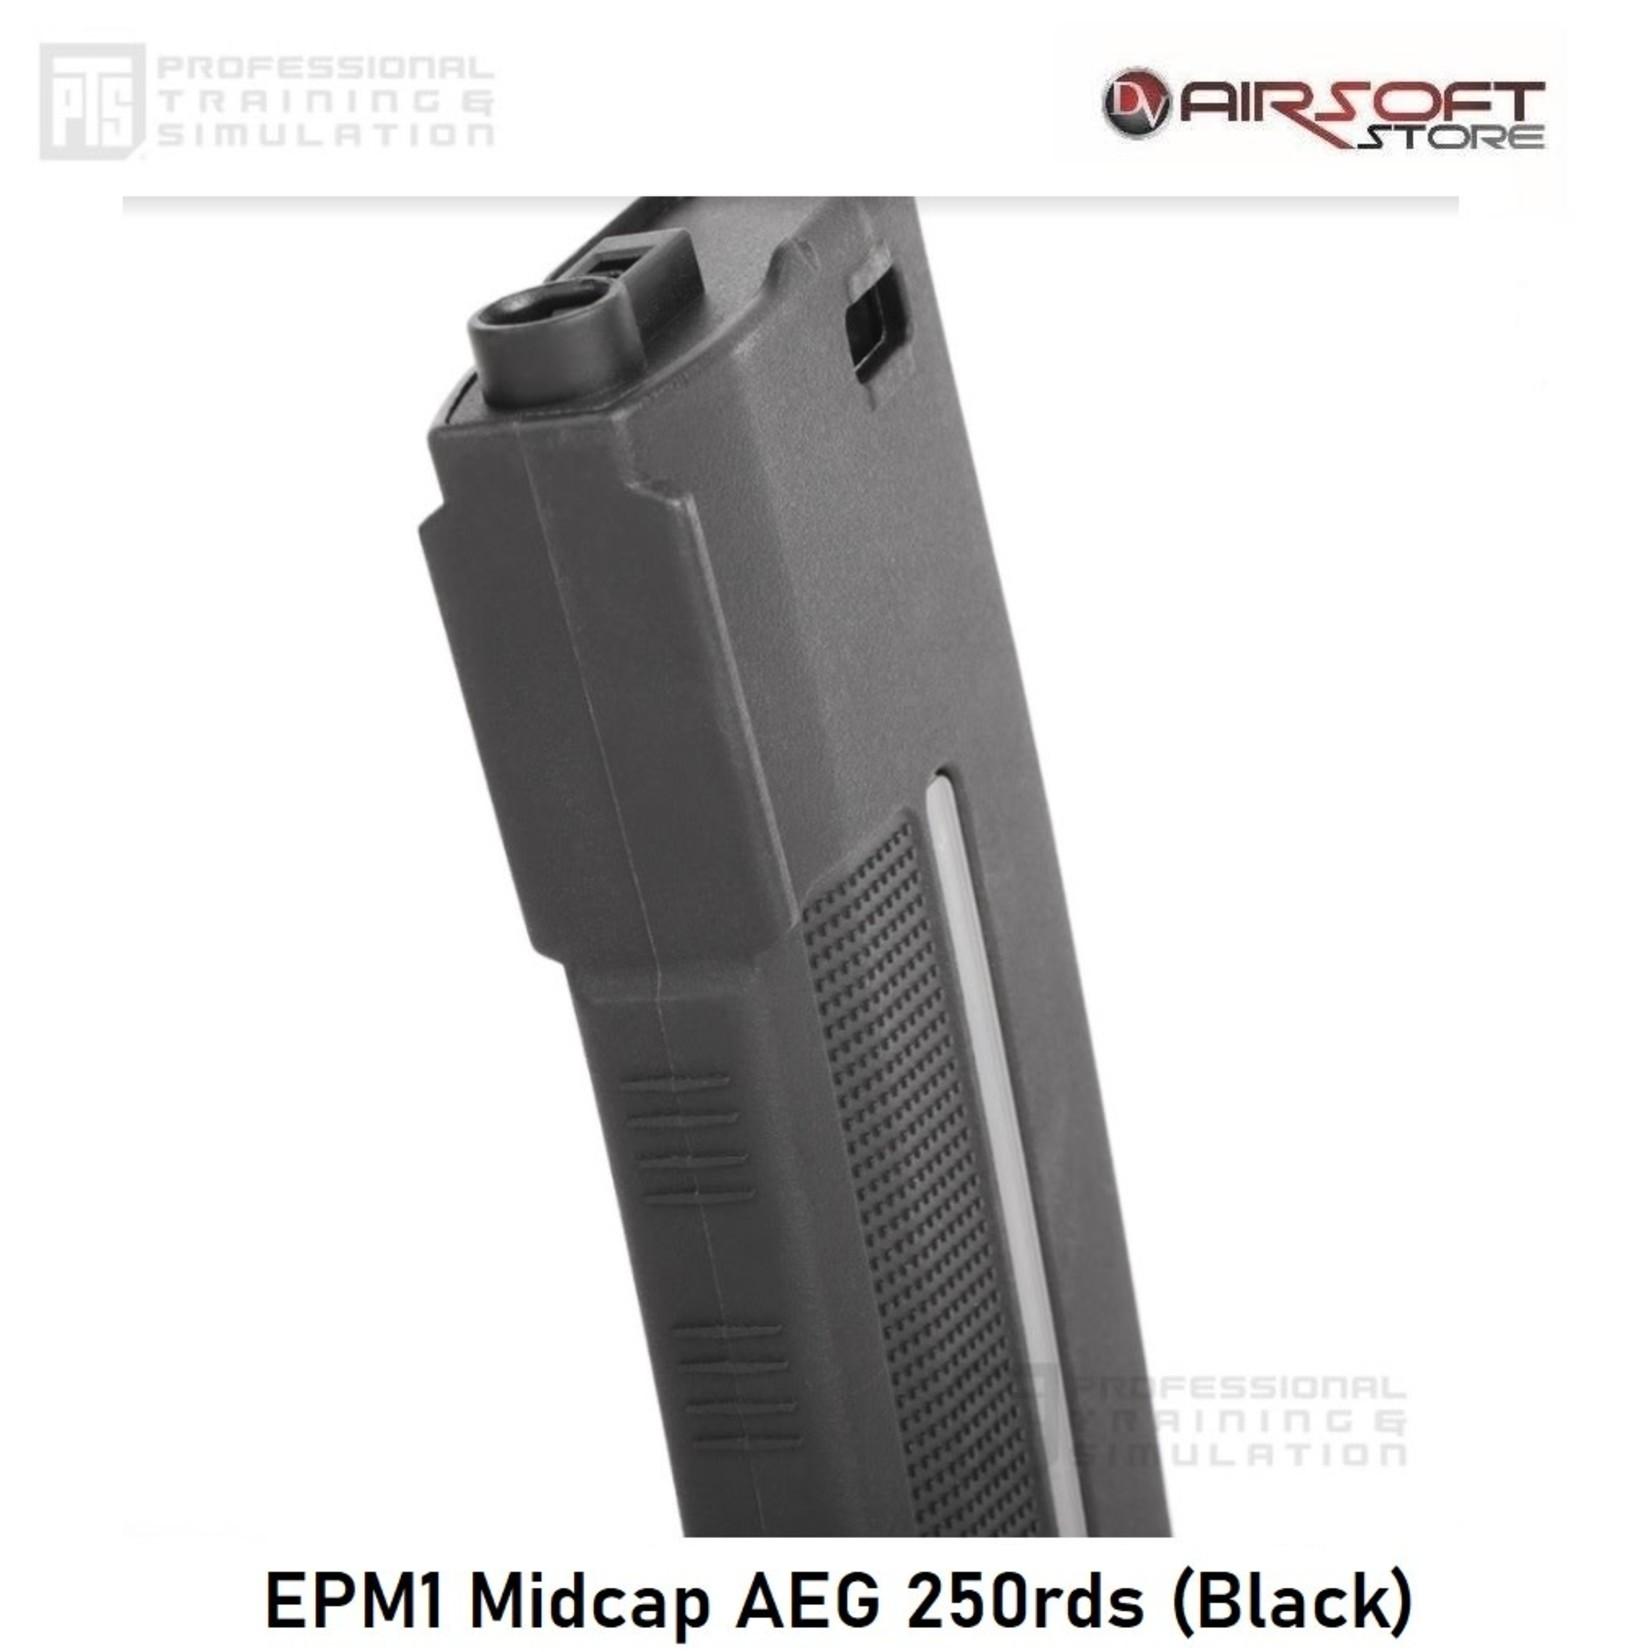 PTS EPM1 Midcap AEG 250rds (Black)